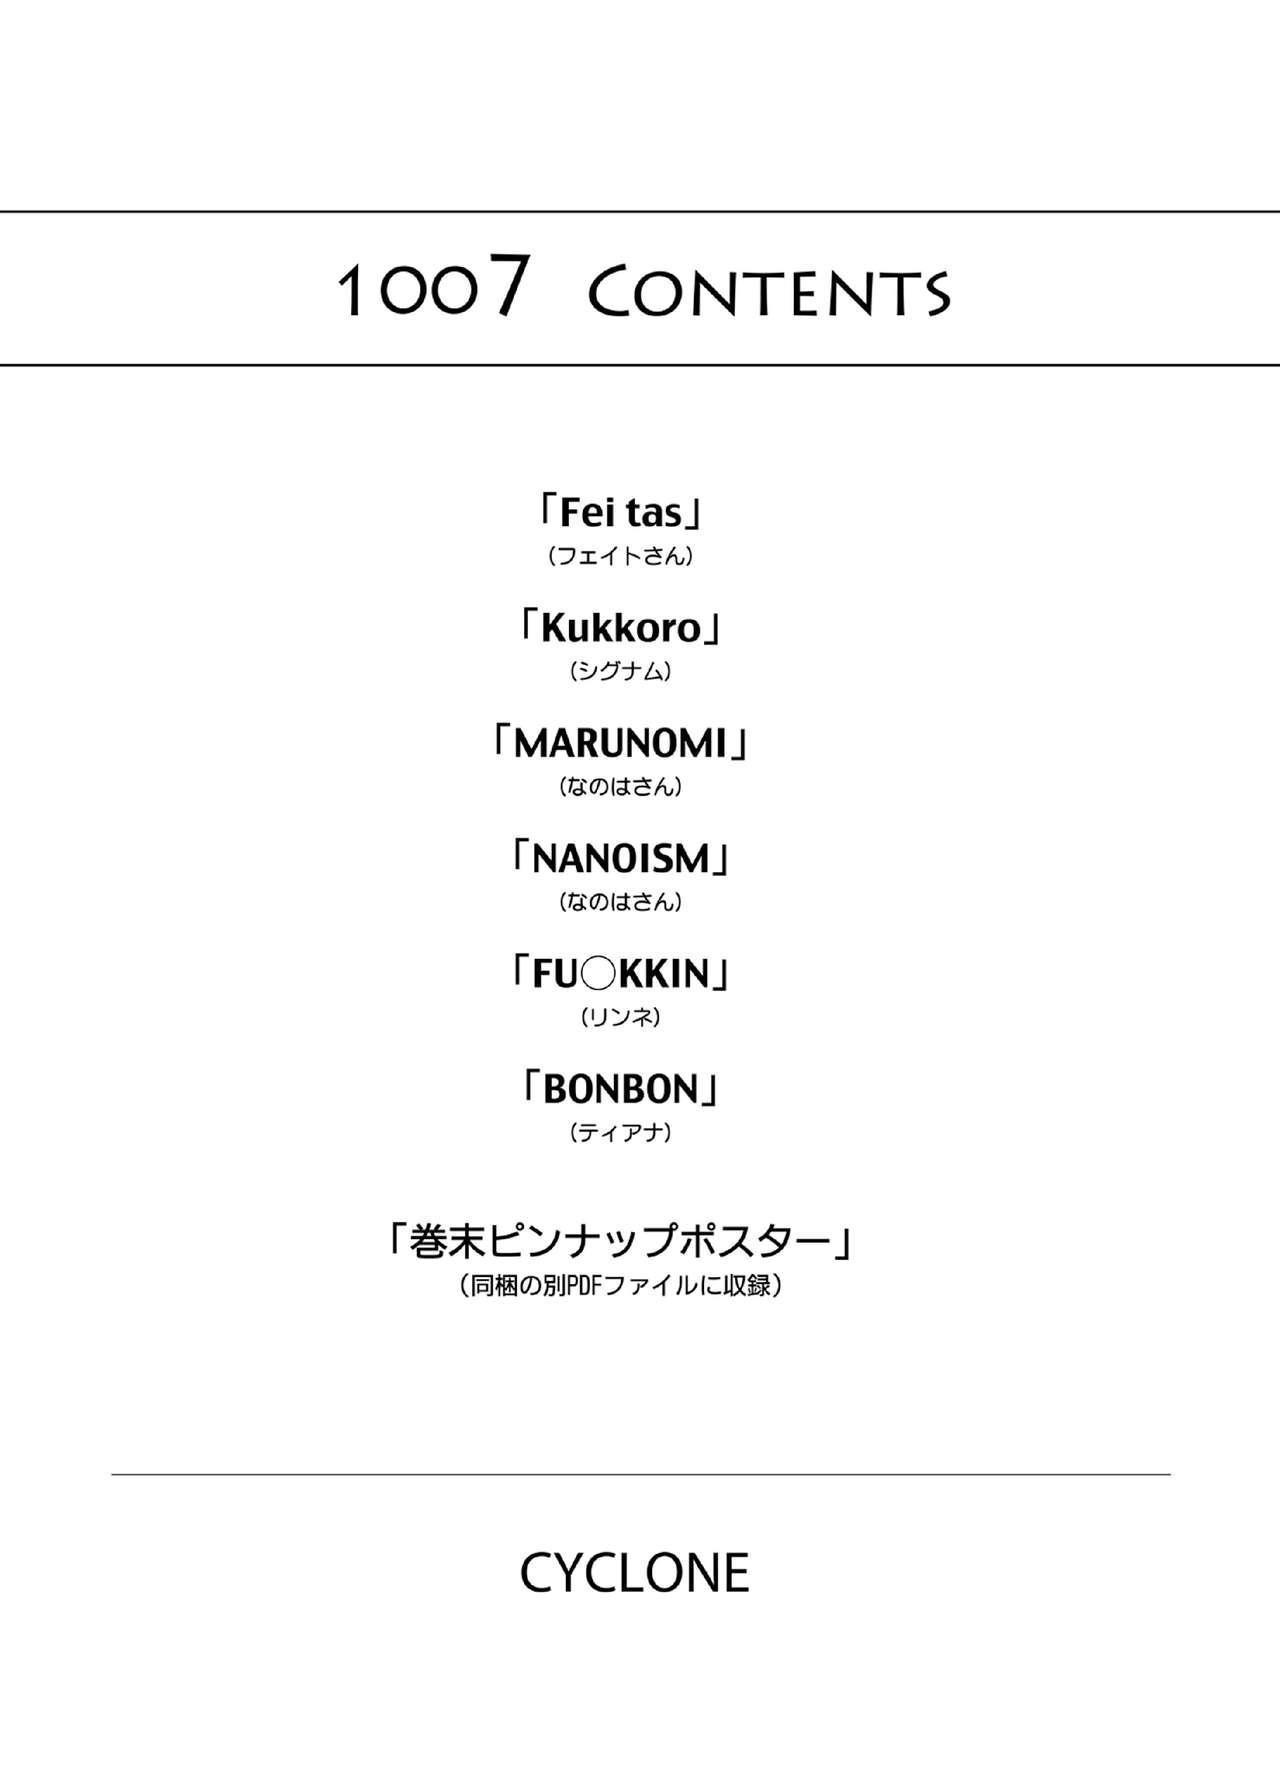 1007CYCLONE 2